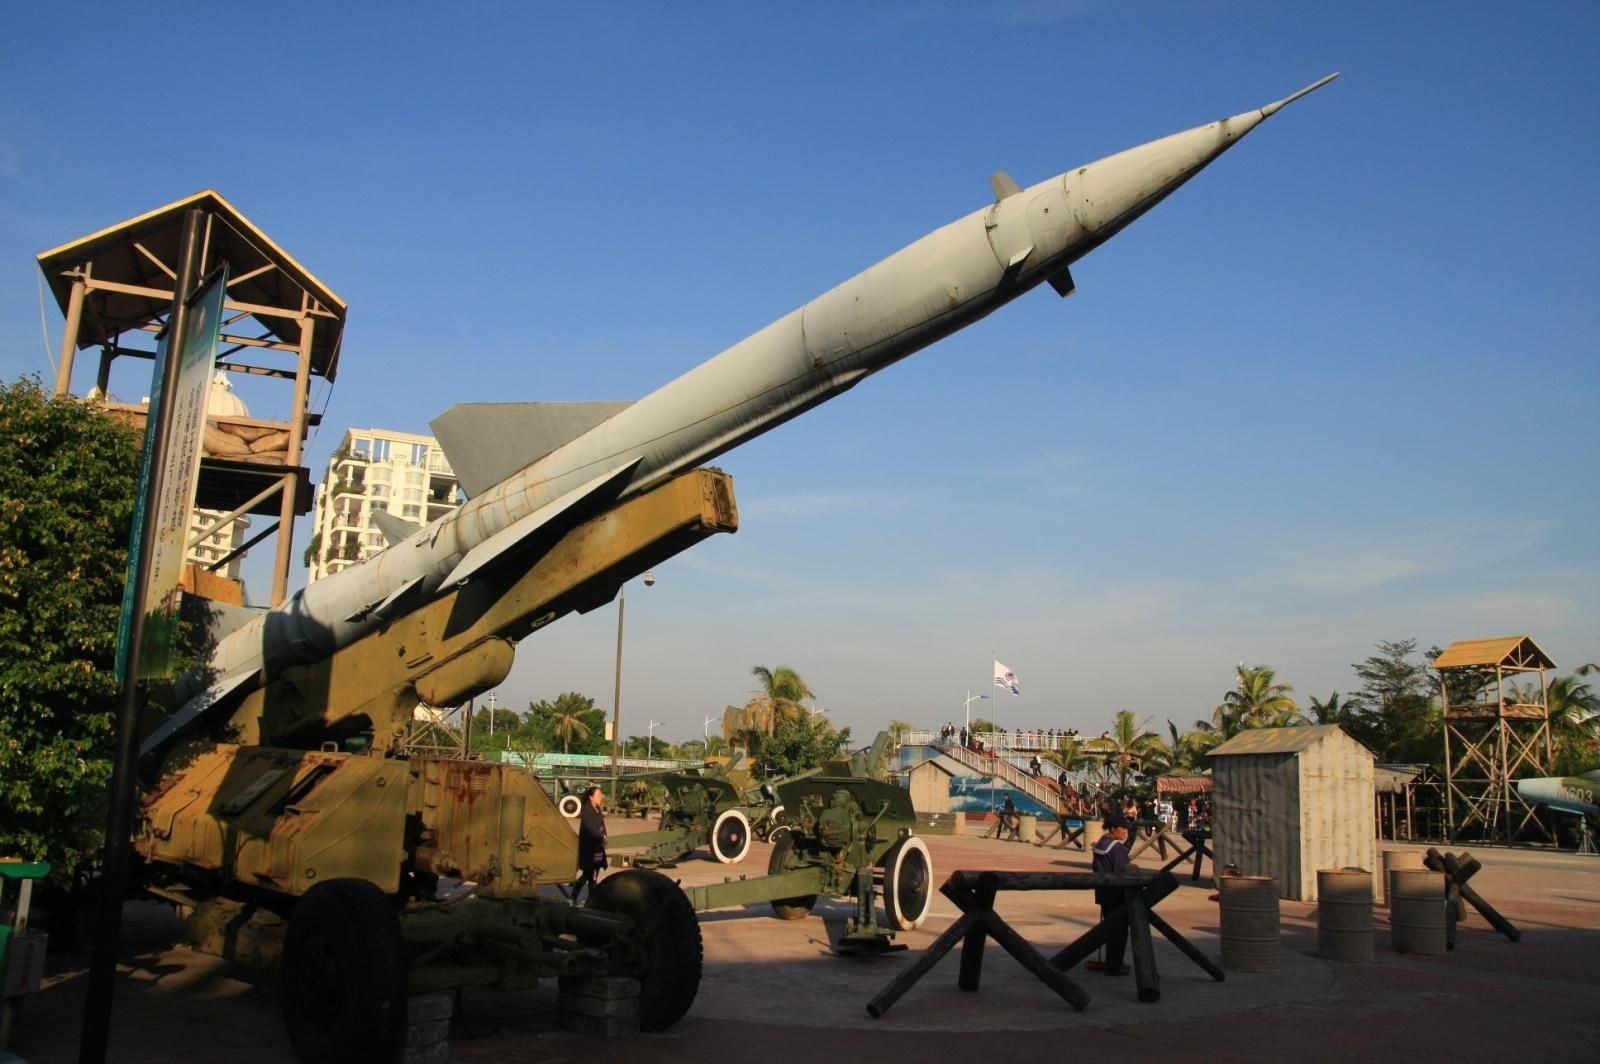 Soviet military stuff!